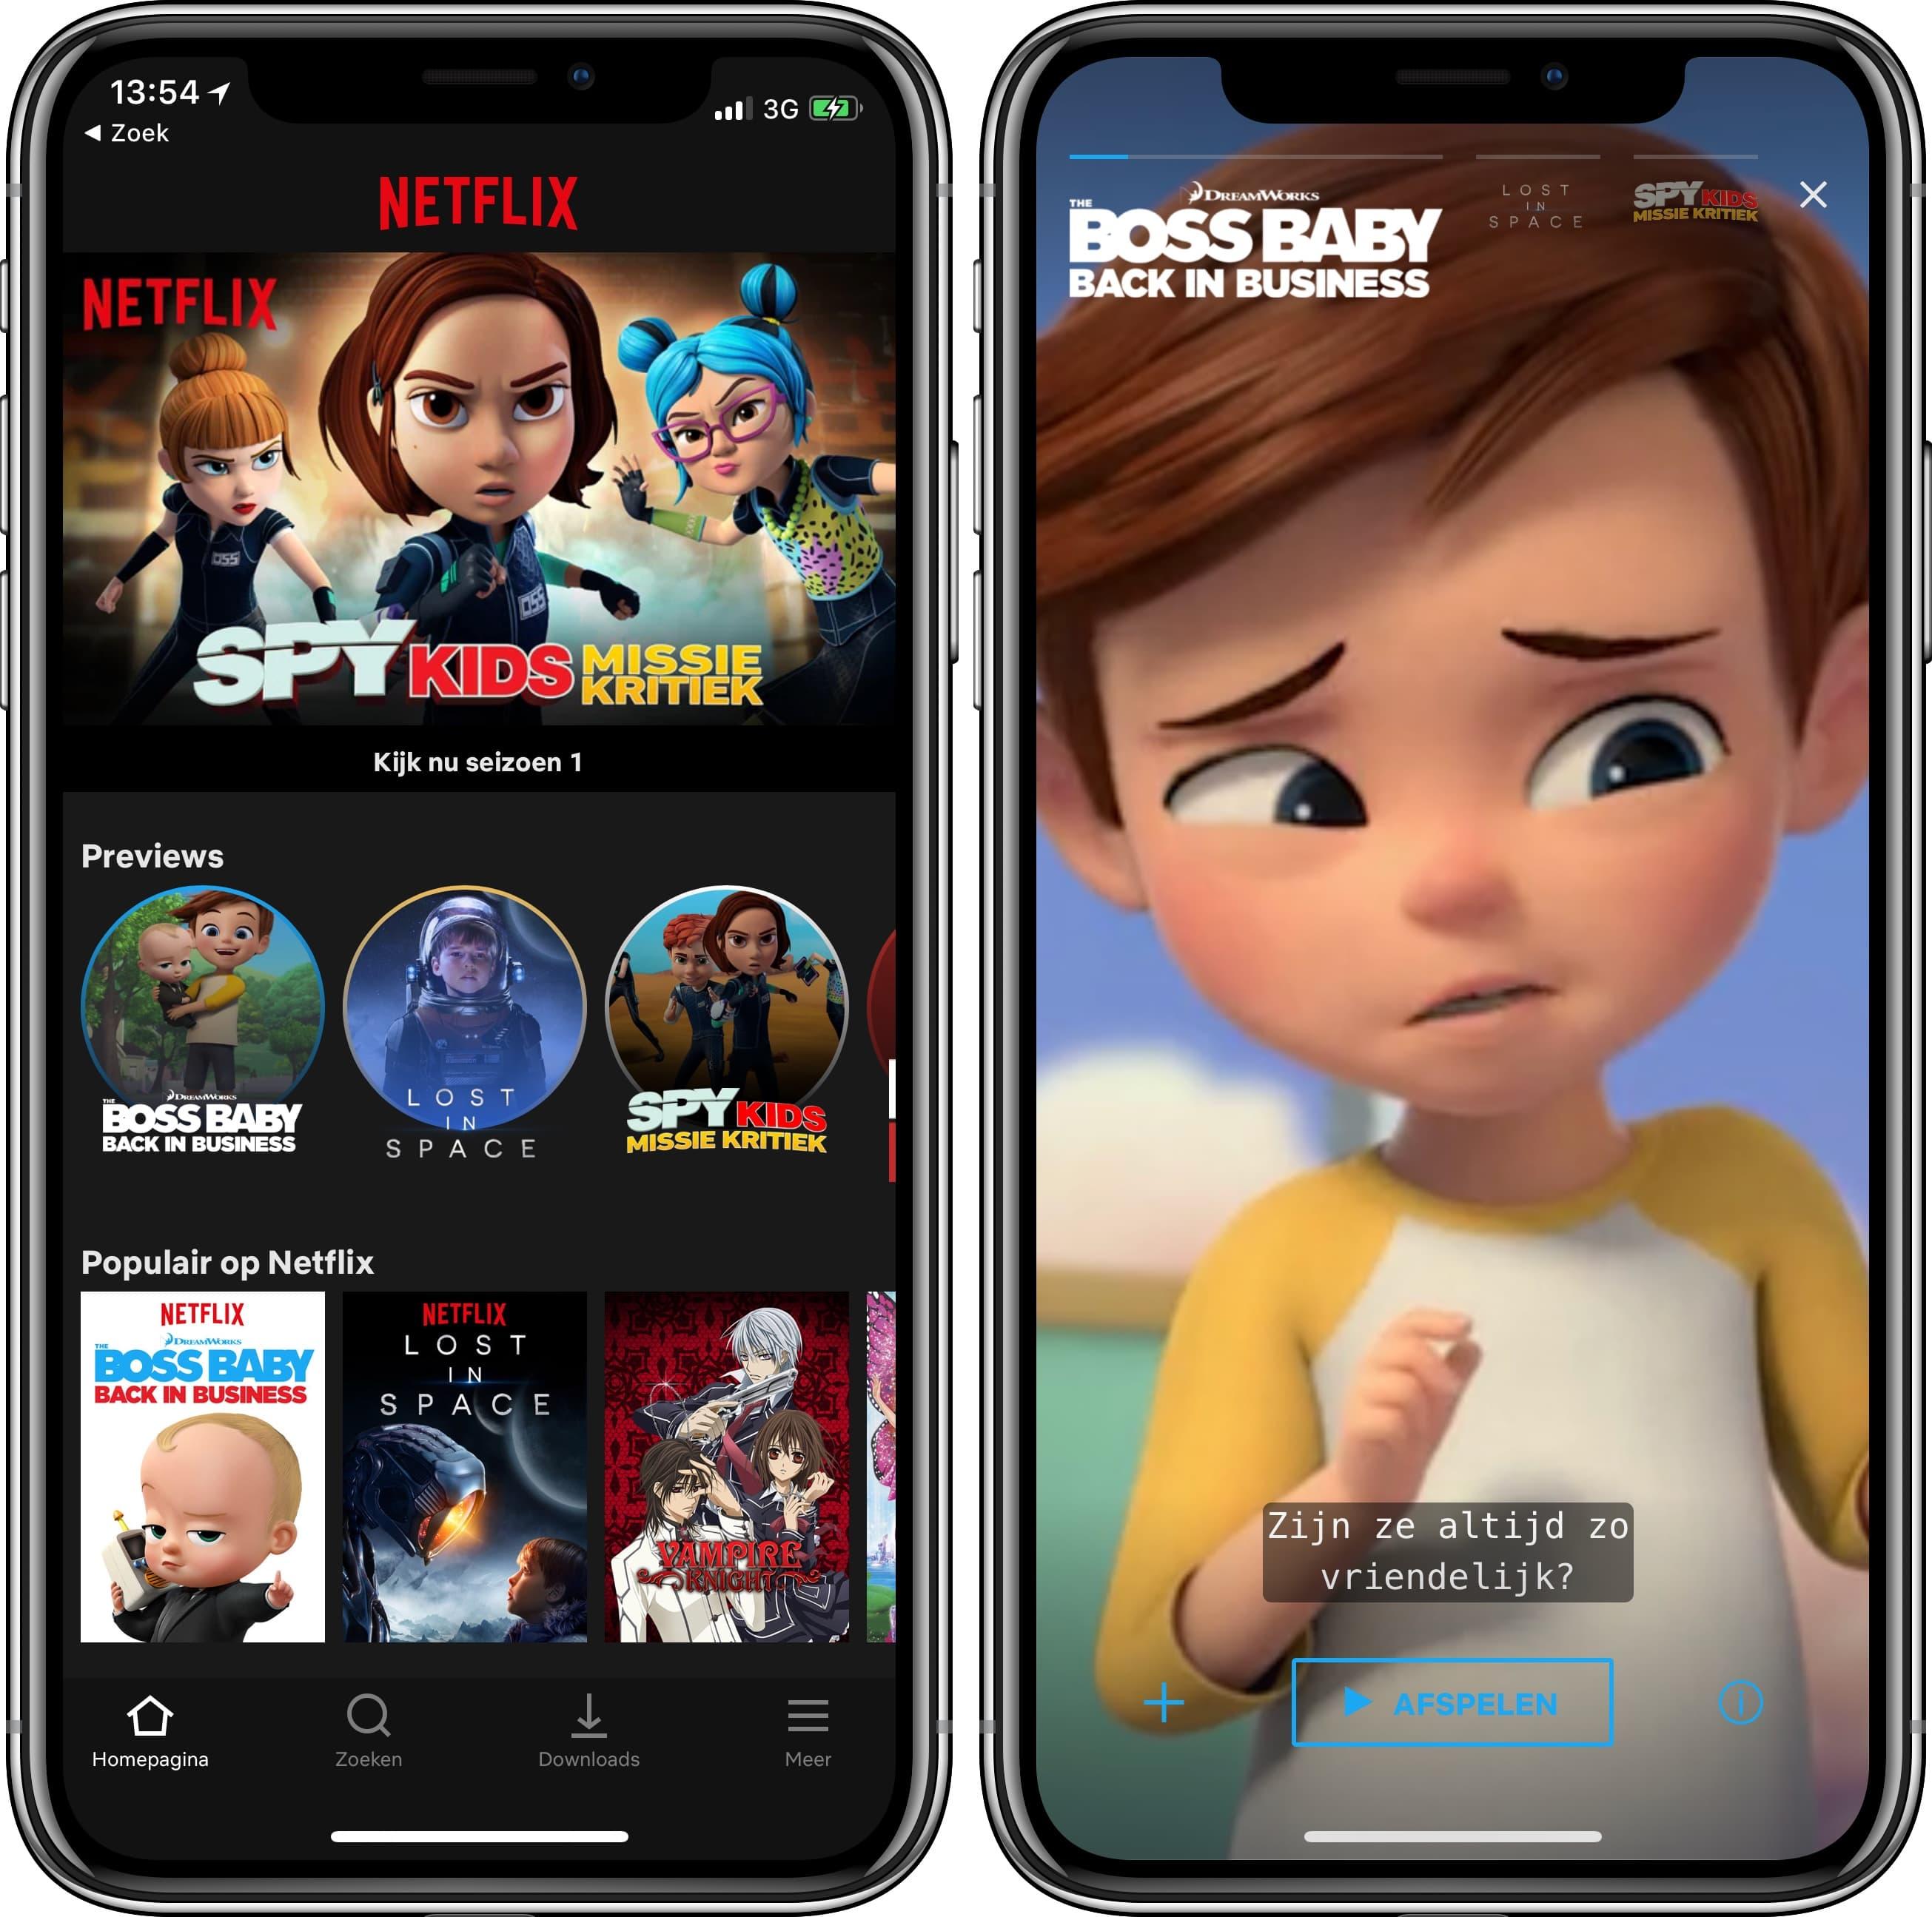 Netflix stories trailers